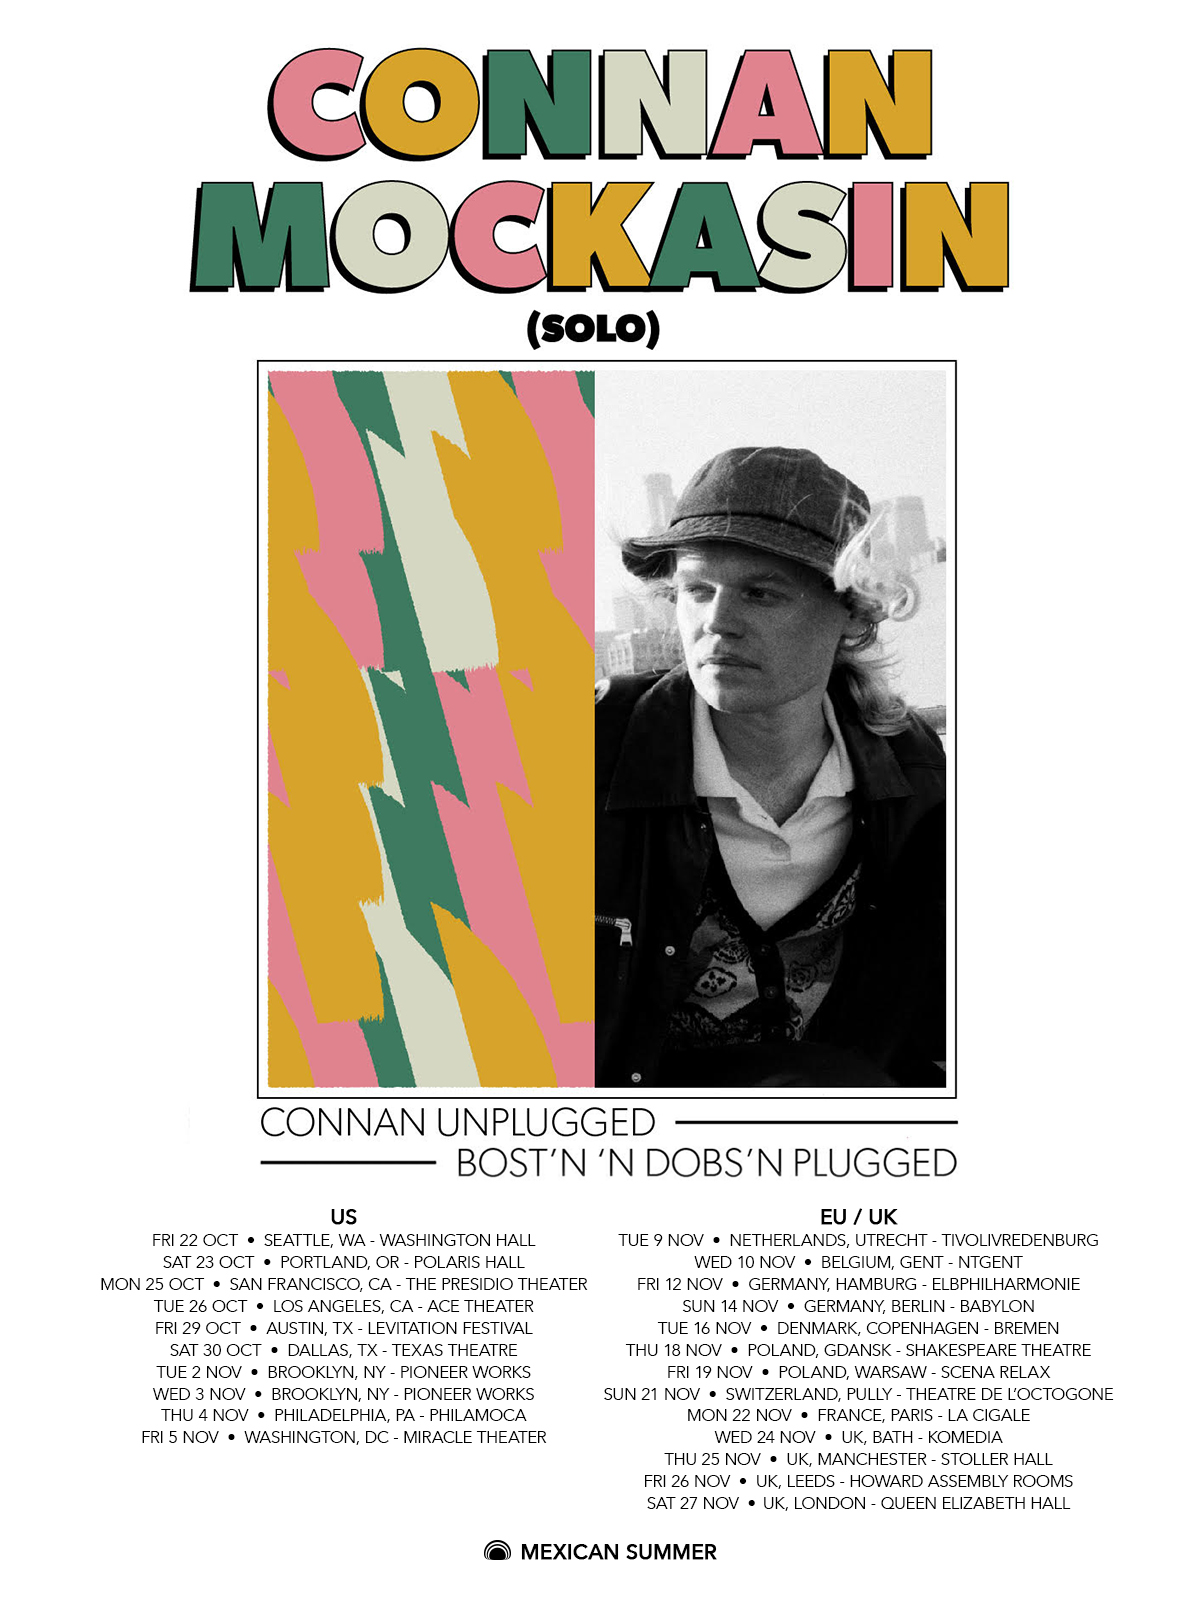 connan mockasin tour poster